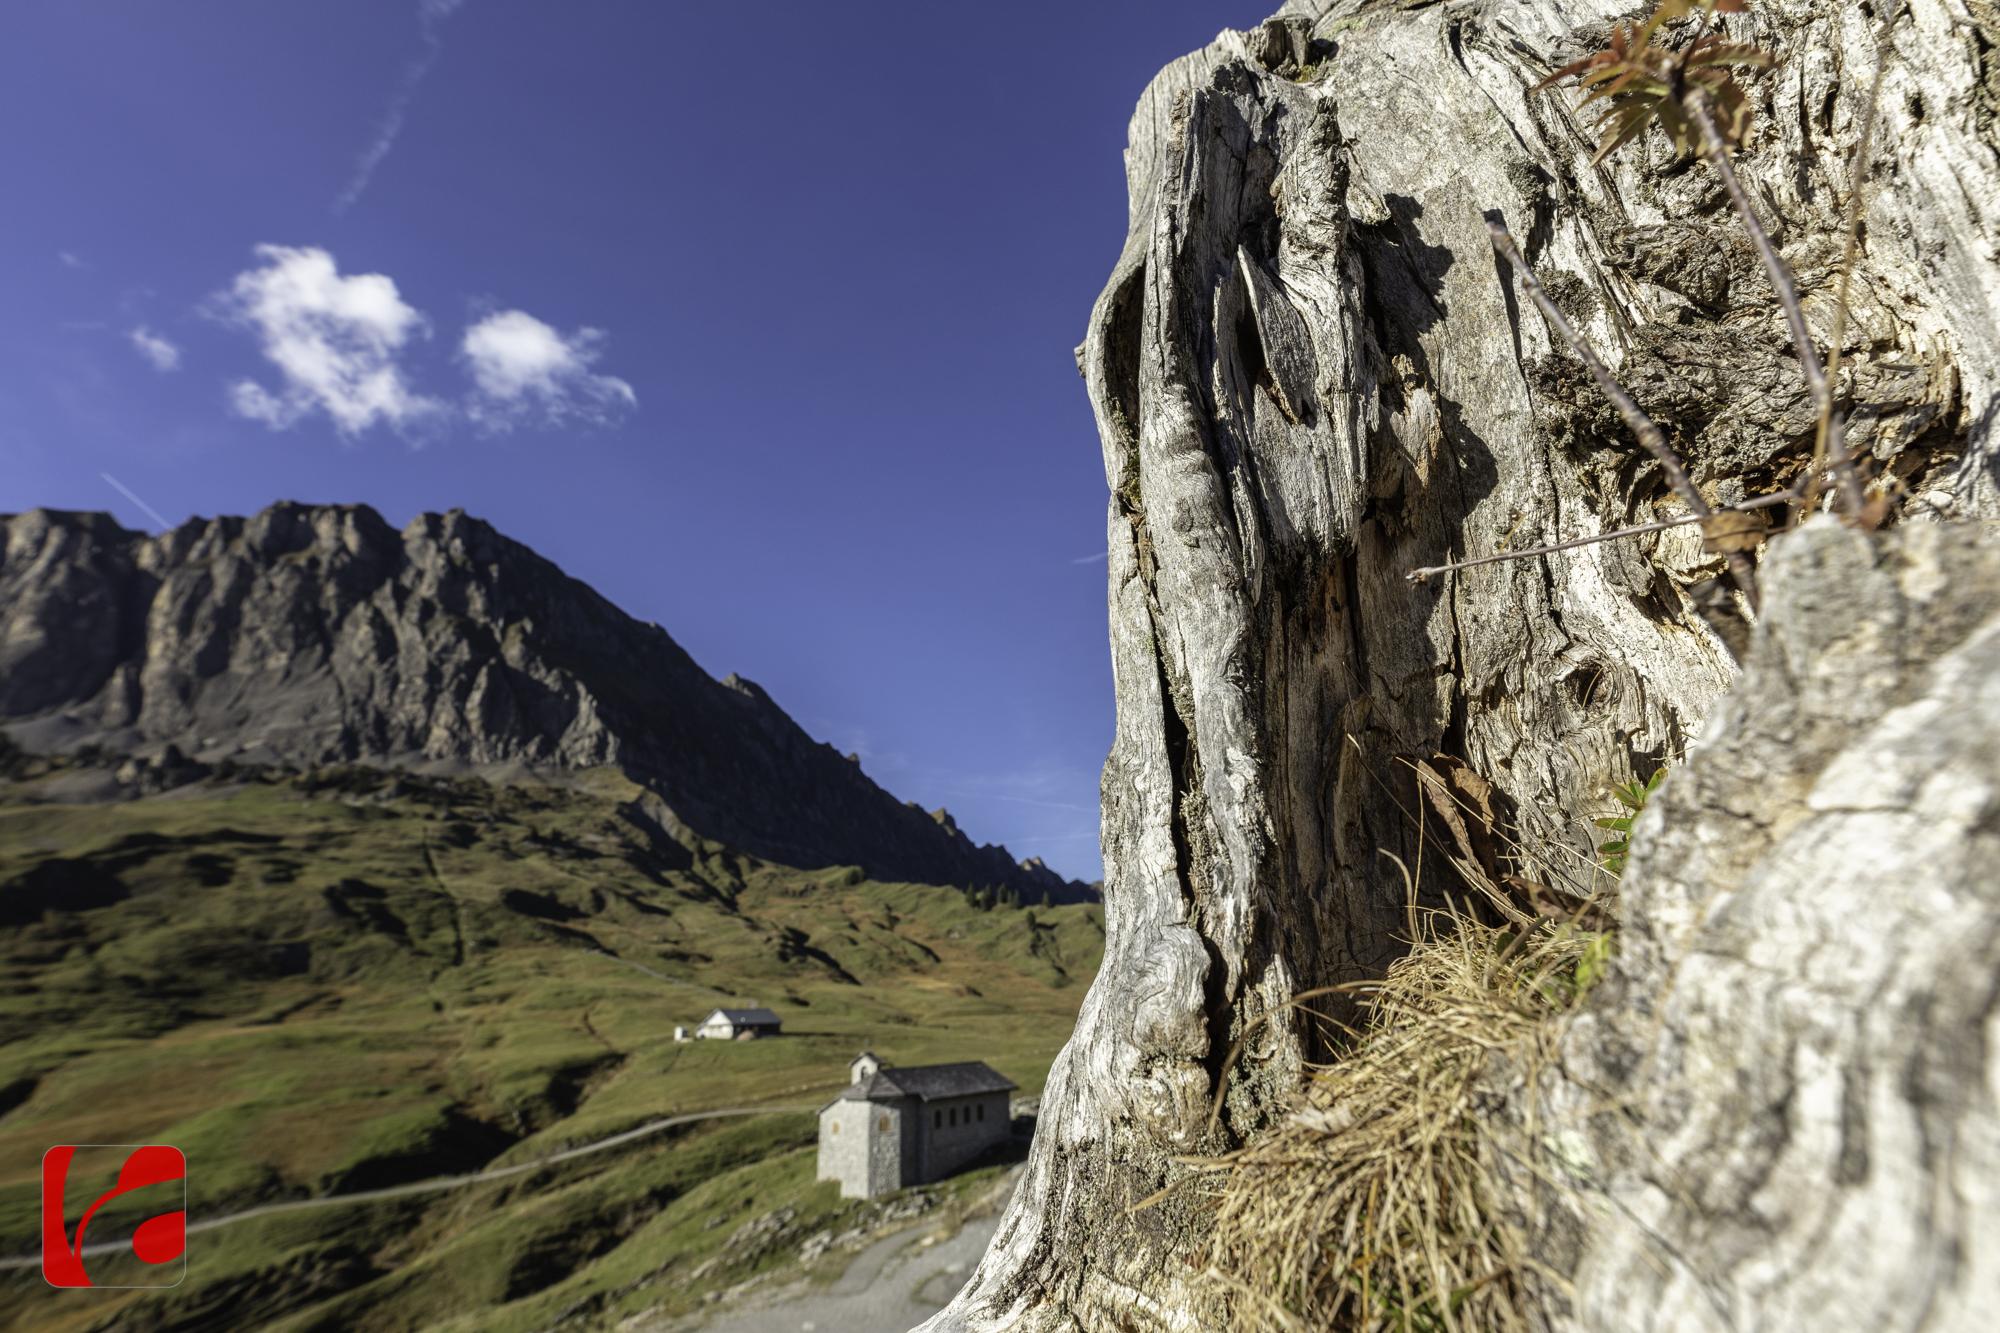 Pragelpass — Der naturbelassene Alpenpass im Herzen der Schweiz